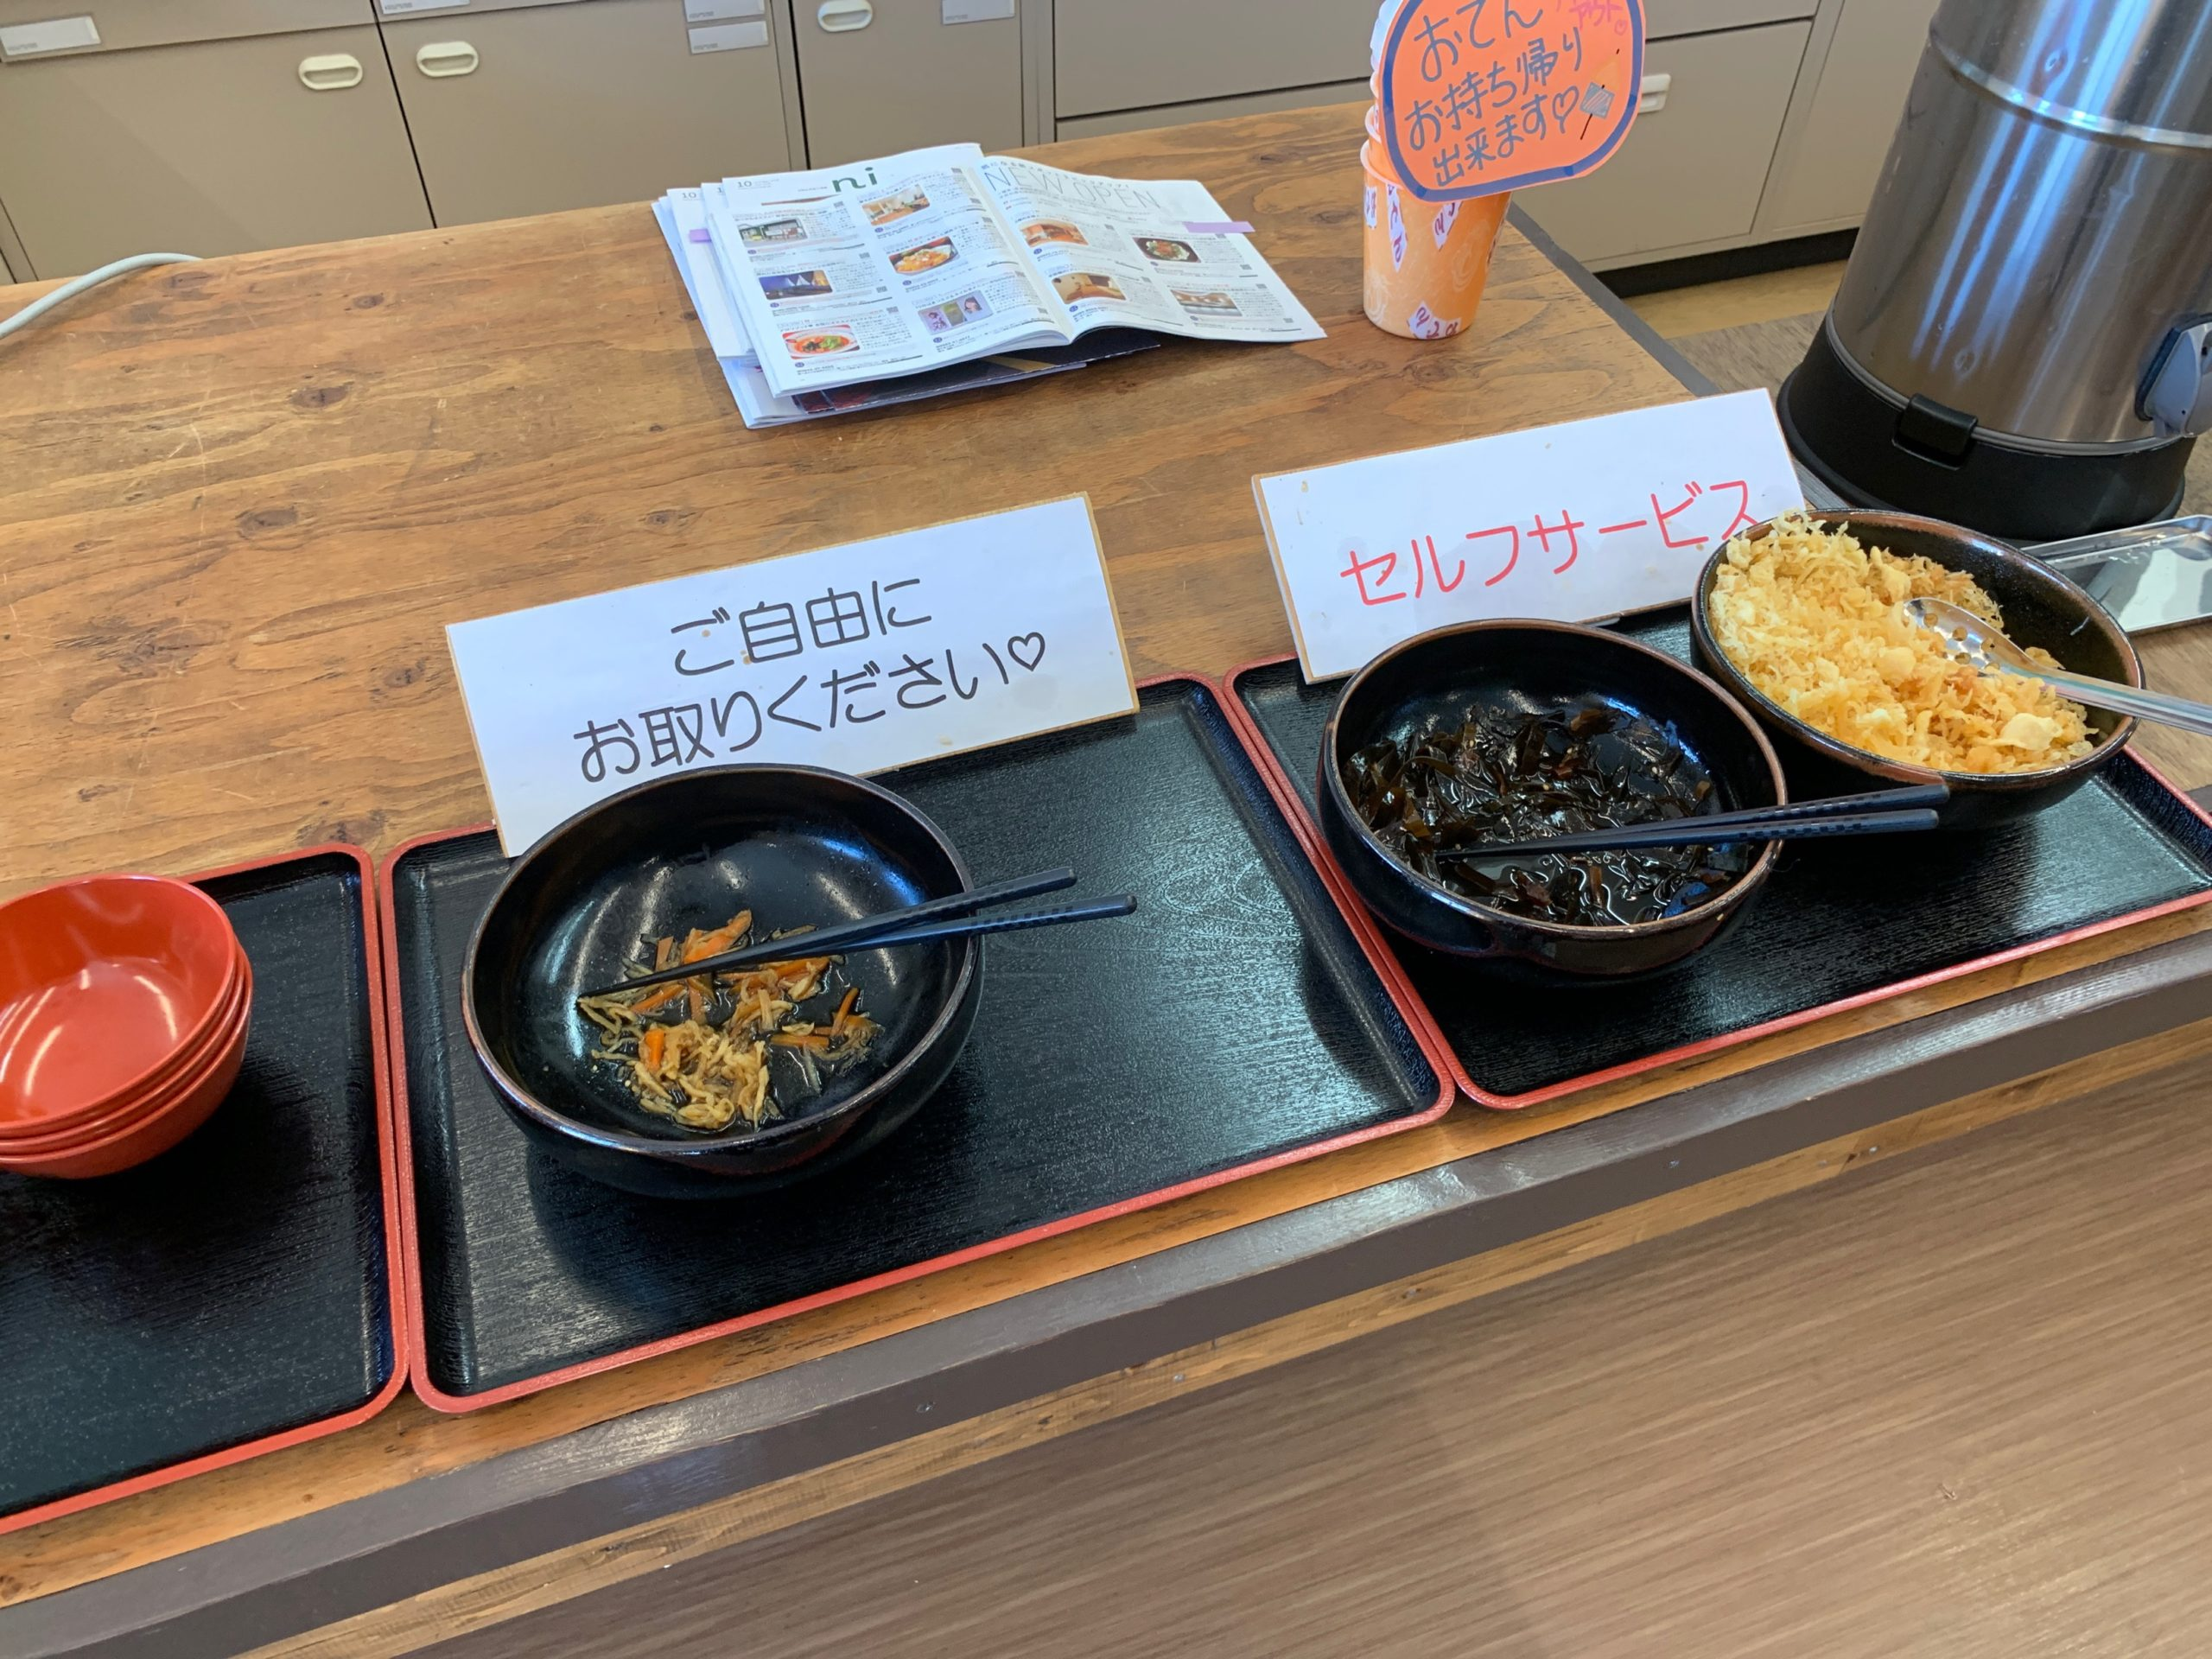 UDON'TSTOP華の取り放題の惣菜コーナー